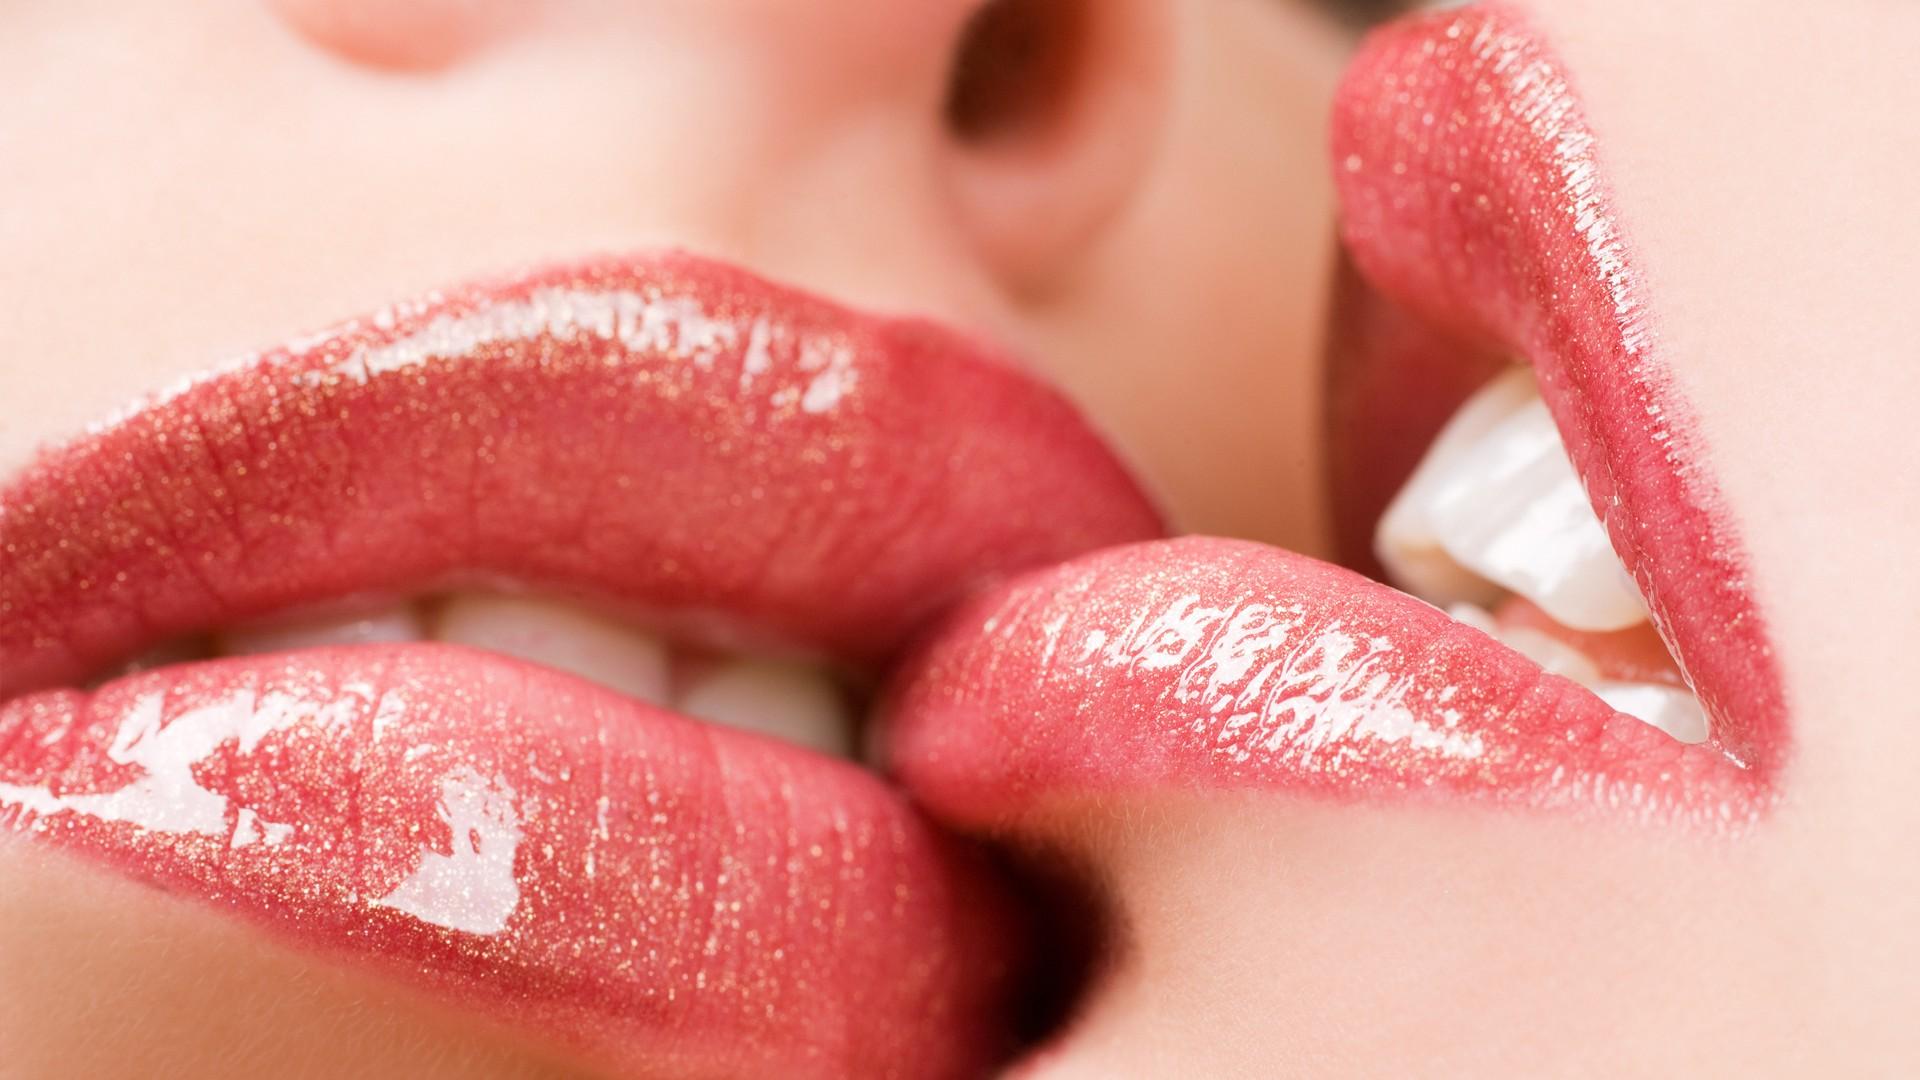 Lips  Kiss  Pomade  Girls HD Wallpaper